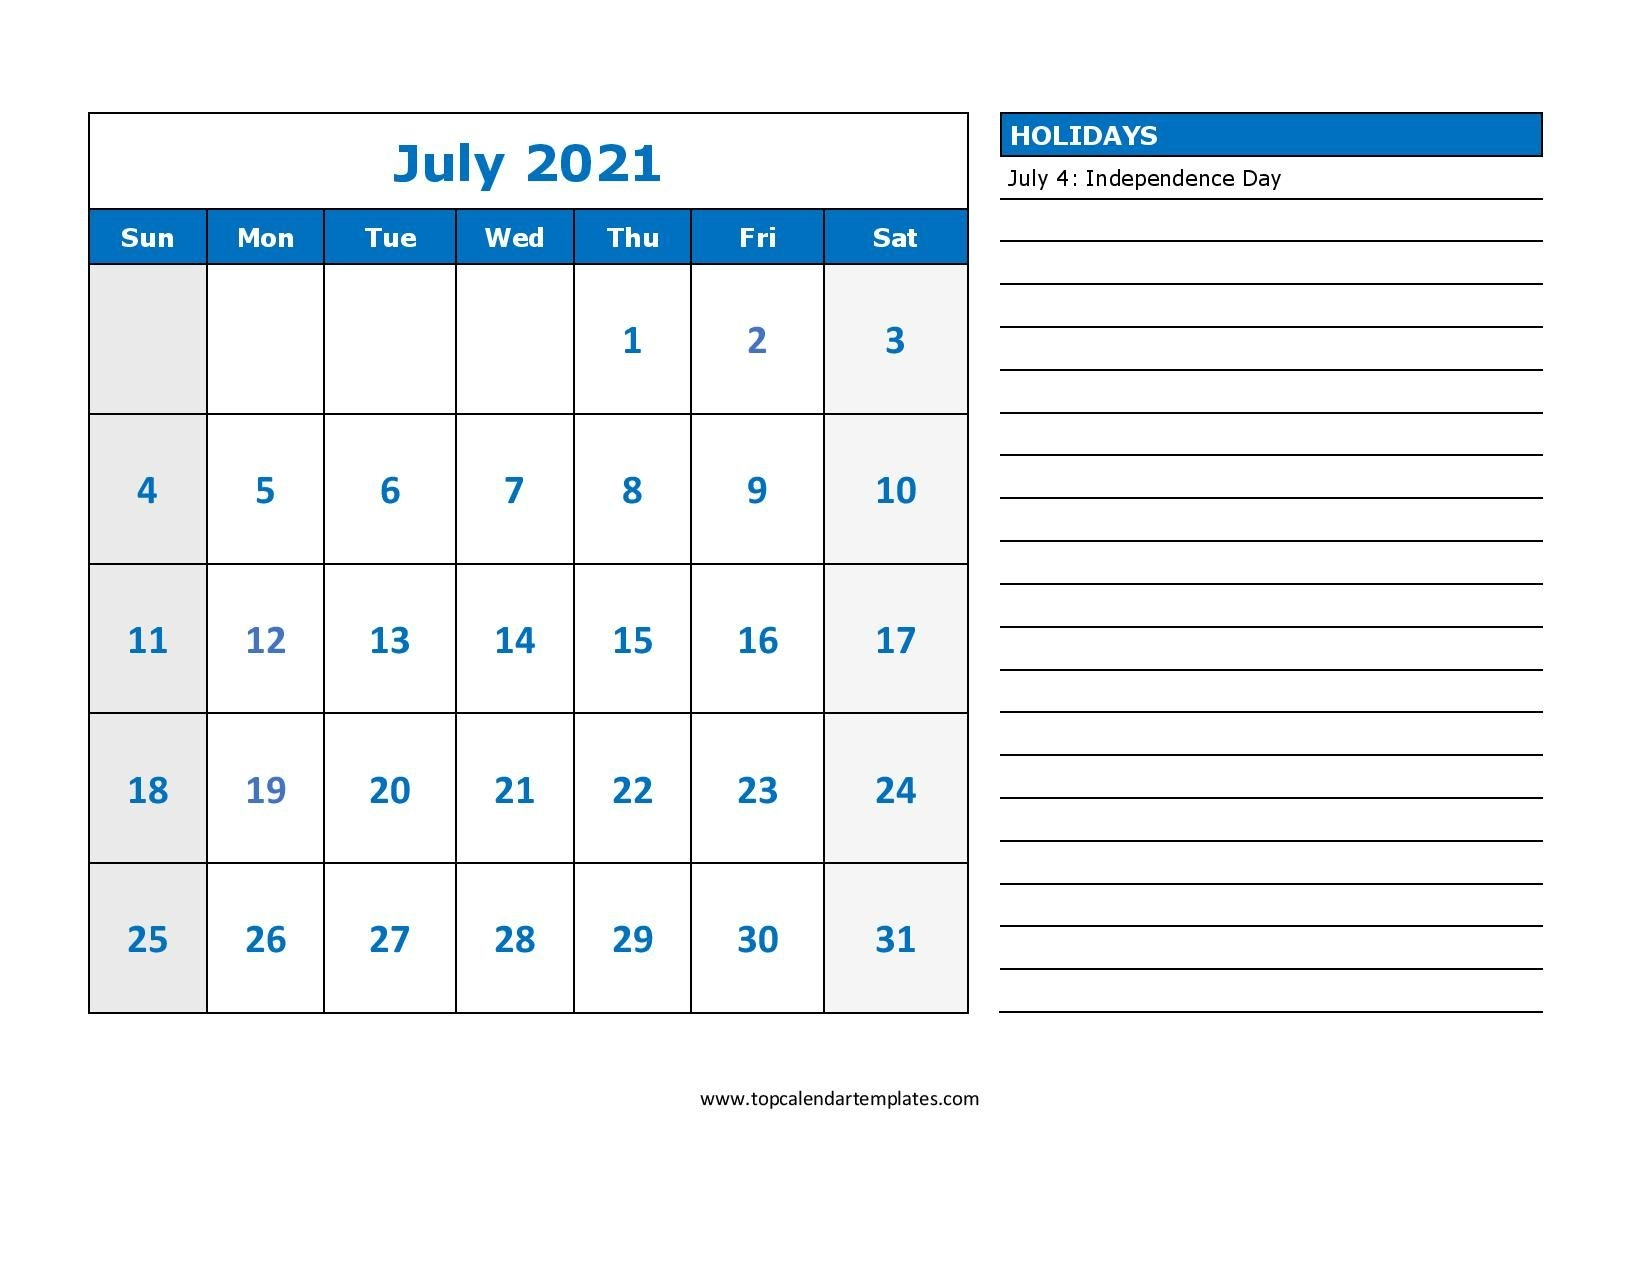 printable july 2021 calendar template pdf, word, excel